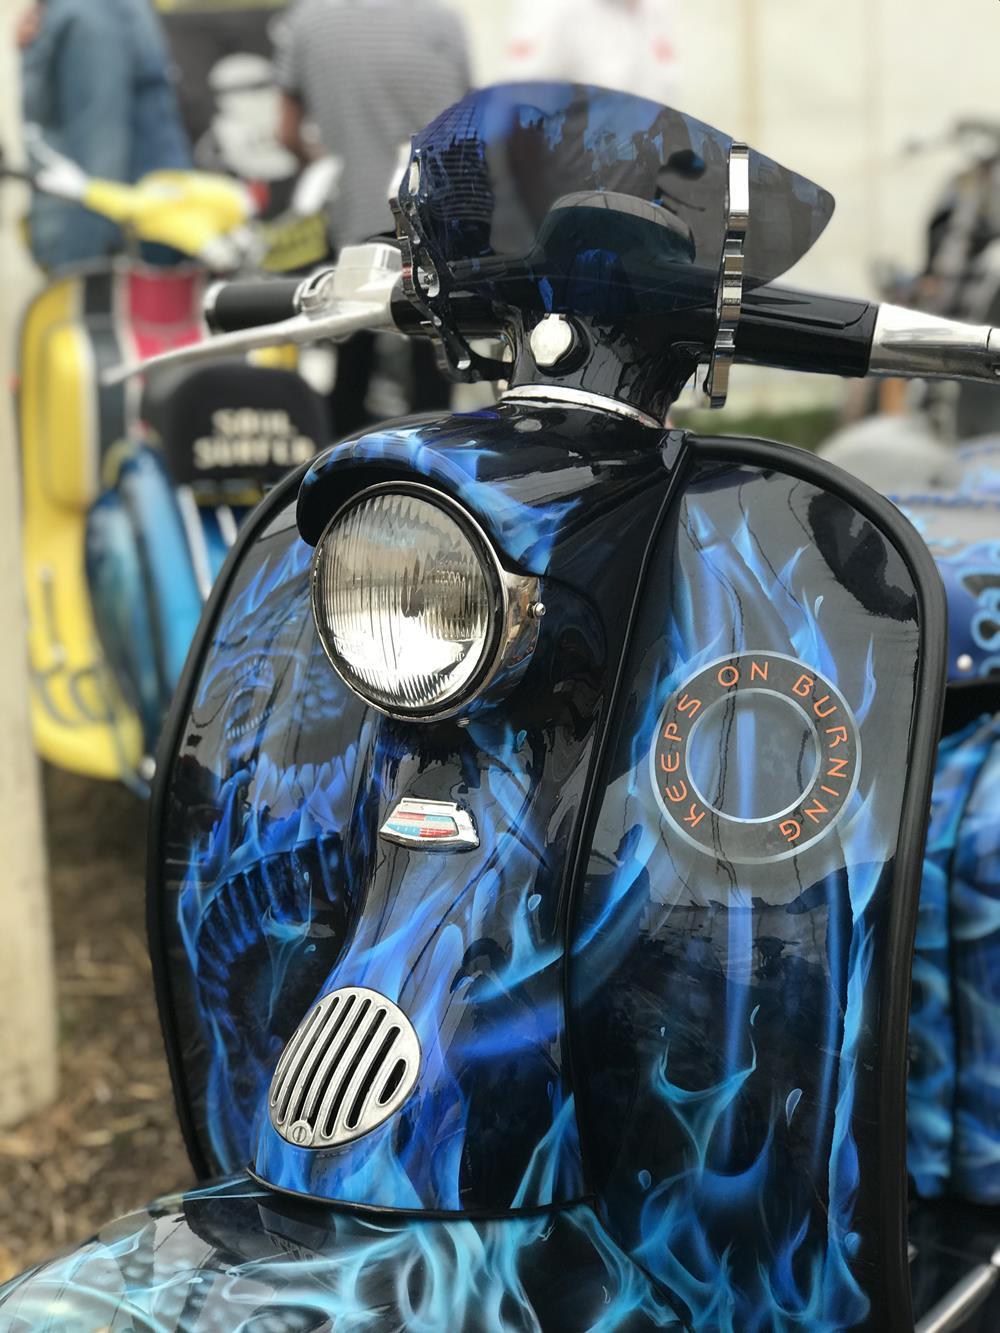 Series 1 Lambretta, Keeps On Burning, front legshield murals and mini flyscreen